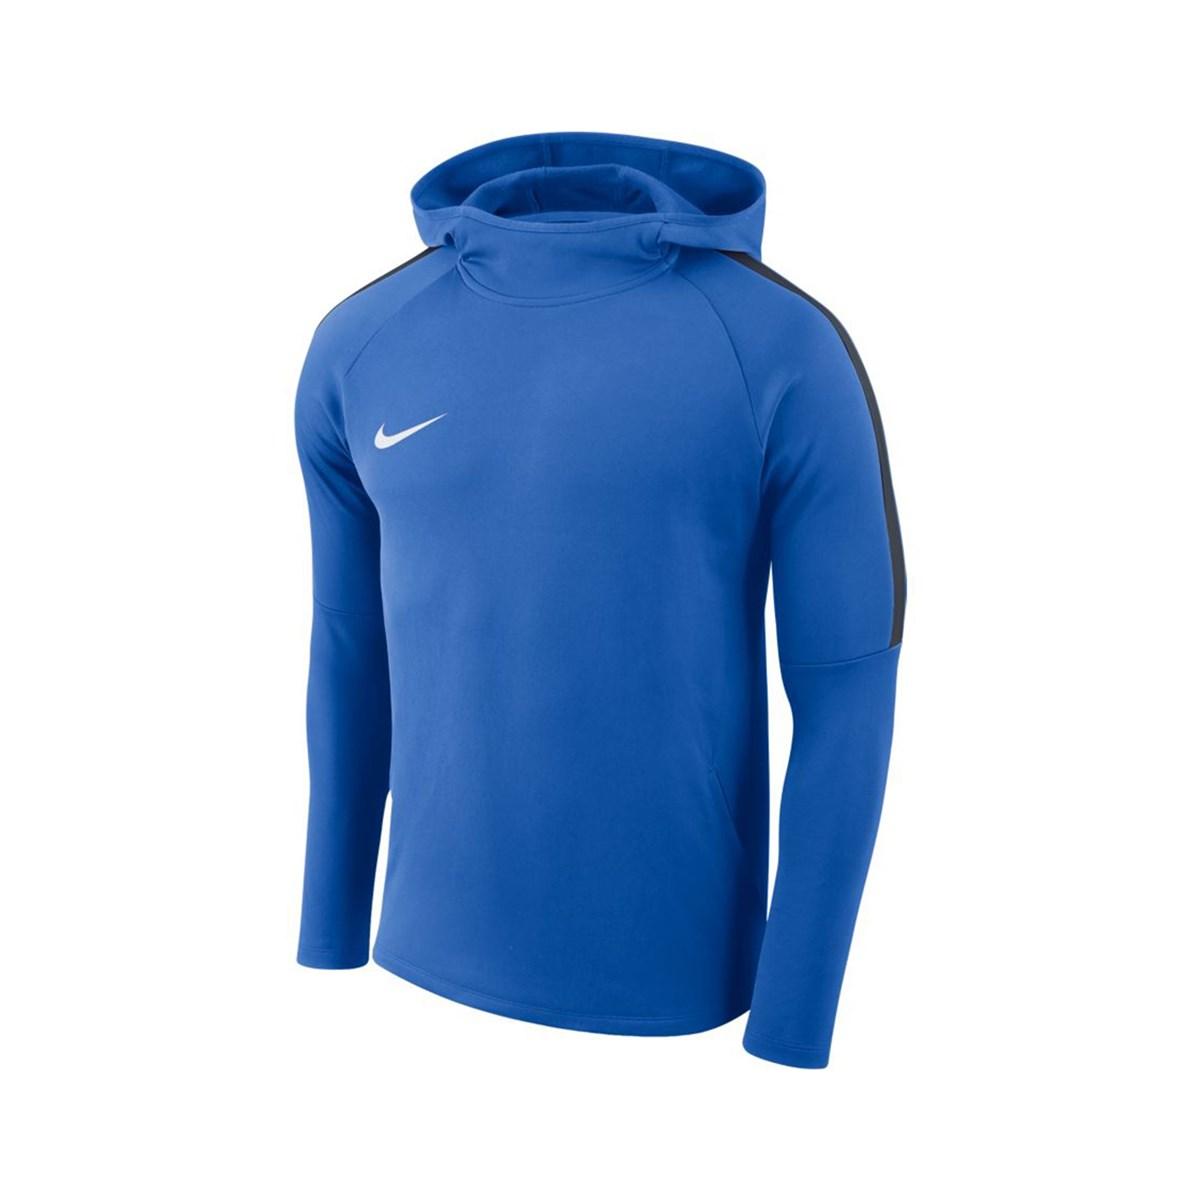 Dry Academy 18 Kapüşonlu Erkek Mavi Sweatshirt